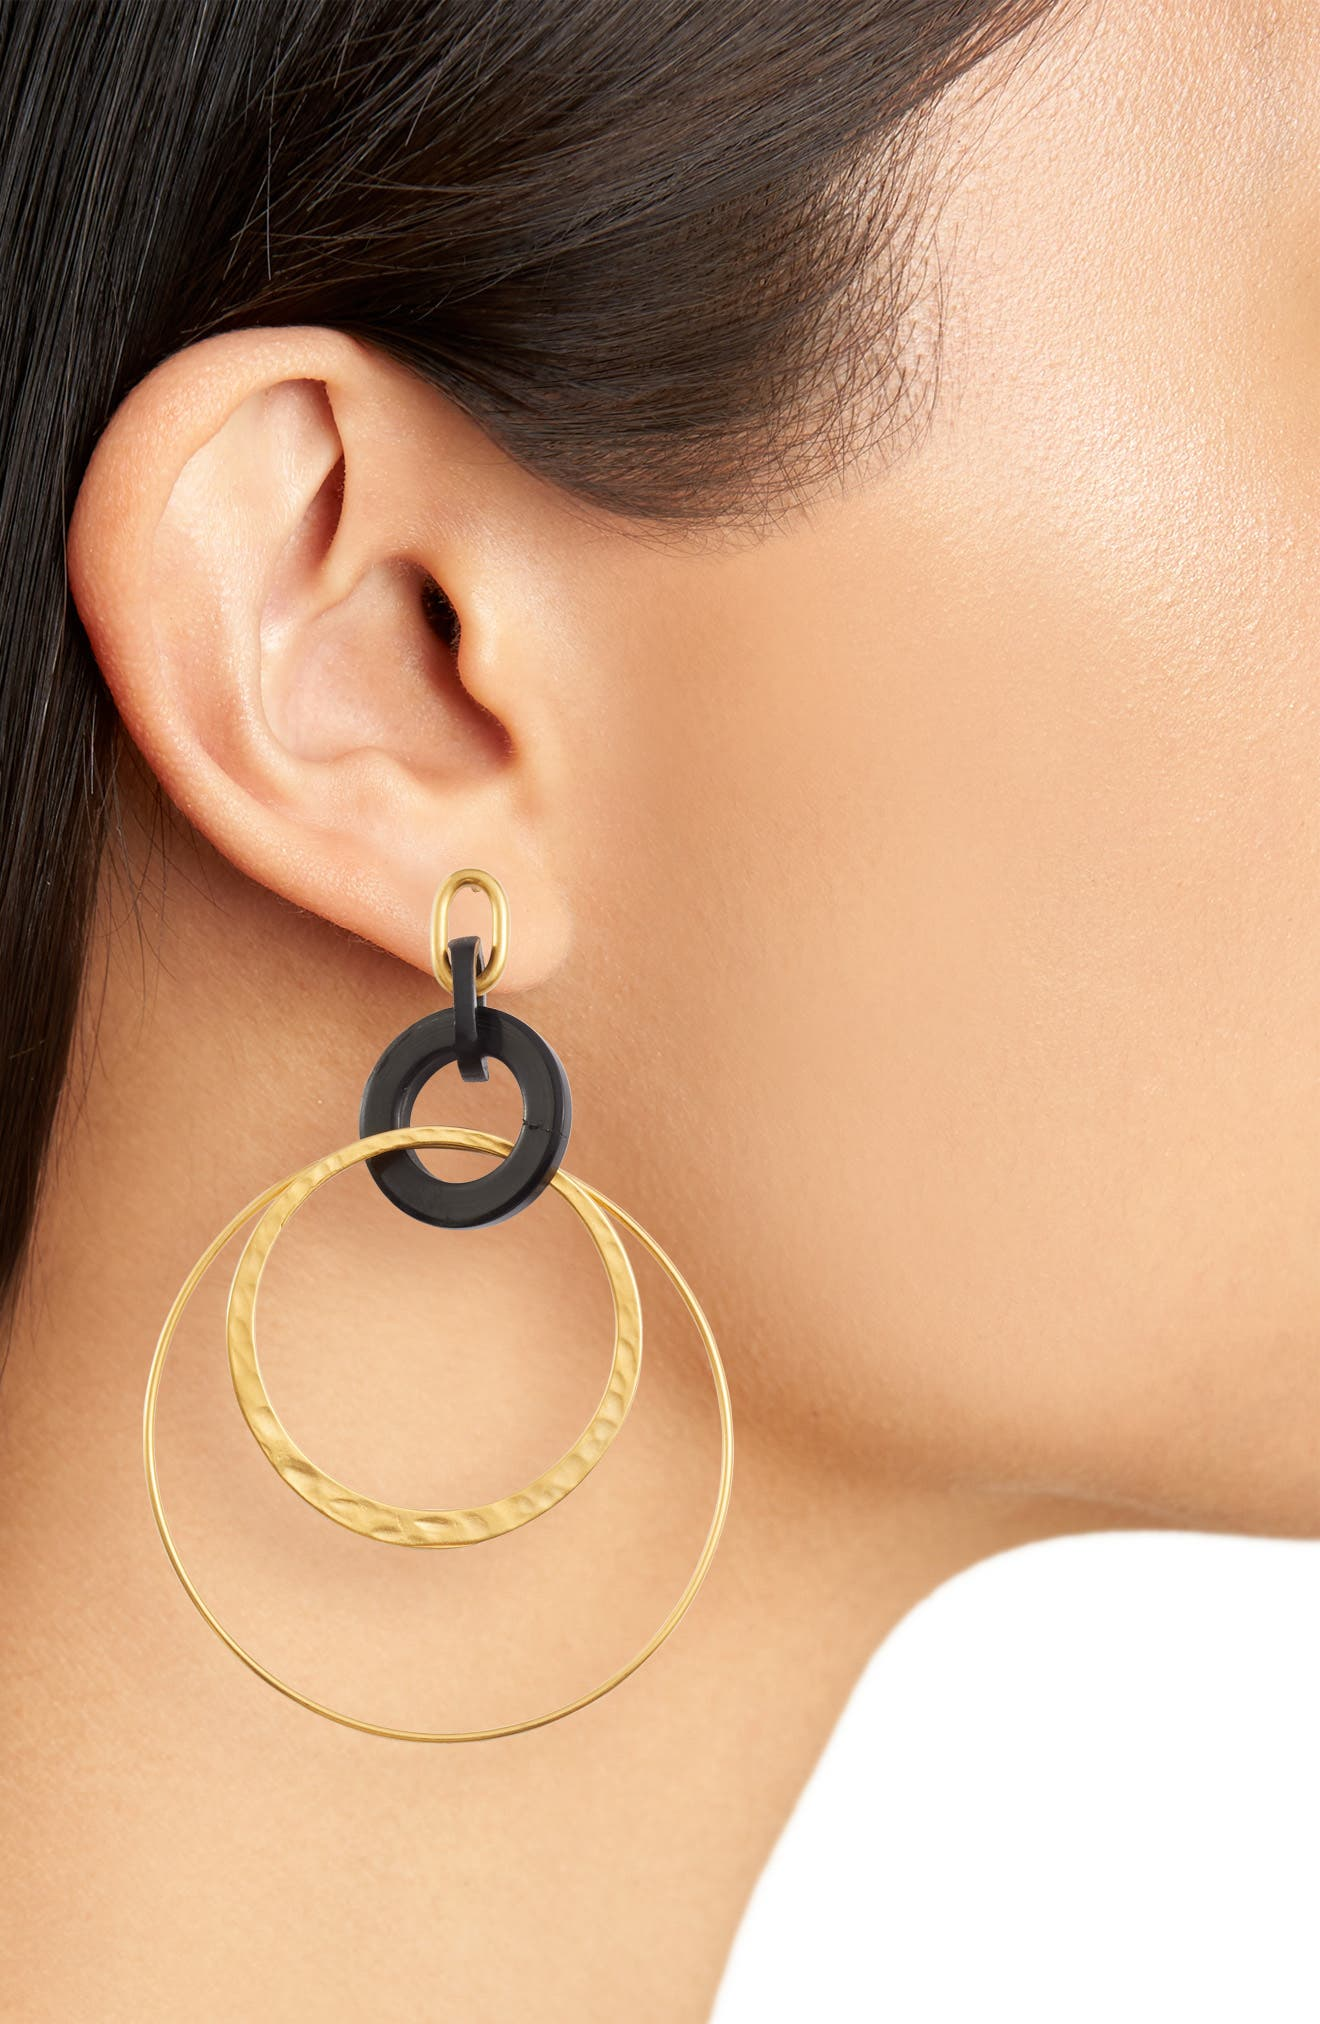 Horn Hoop Earrings,                             Alternate thumbnail 2, color,                             001